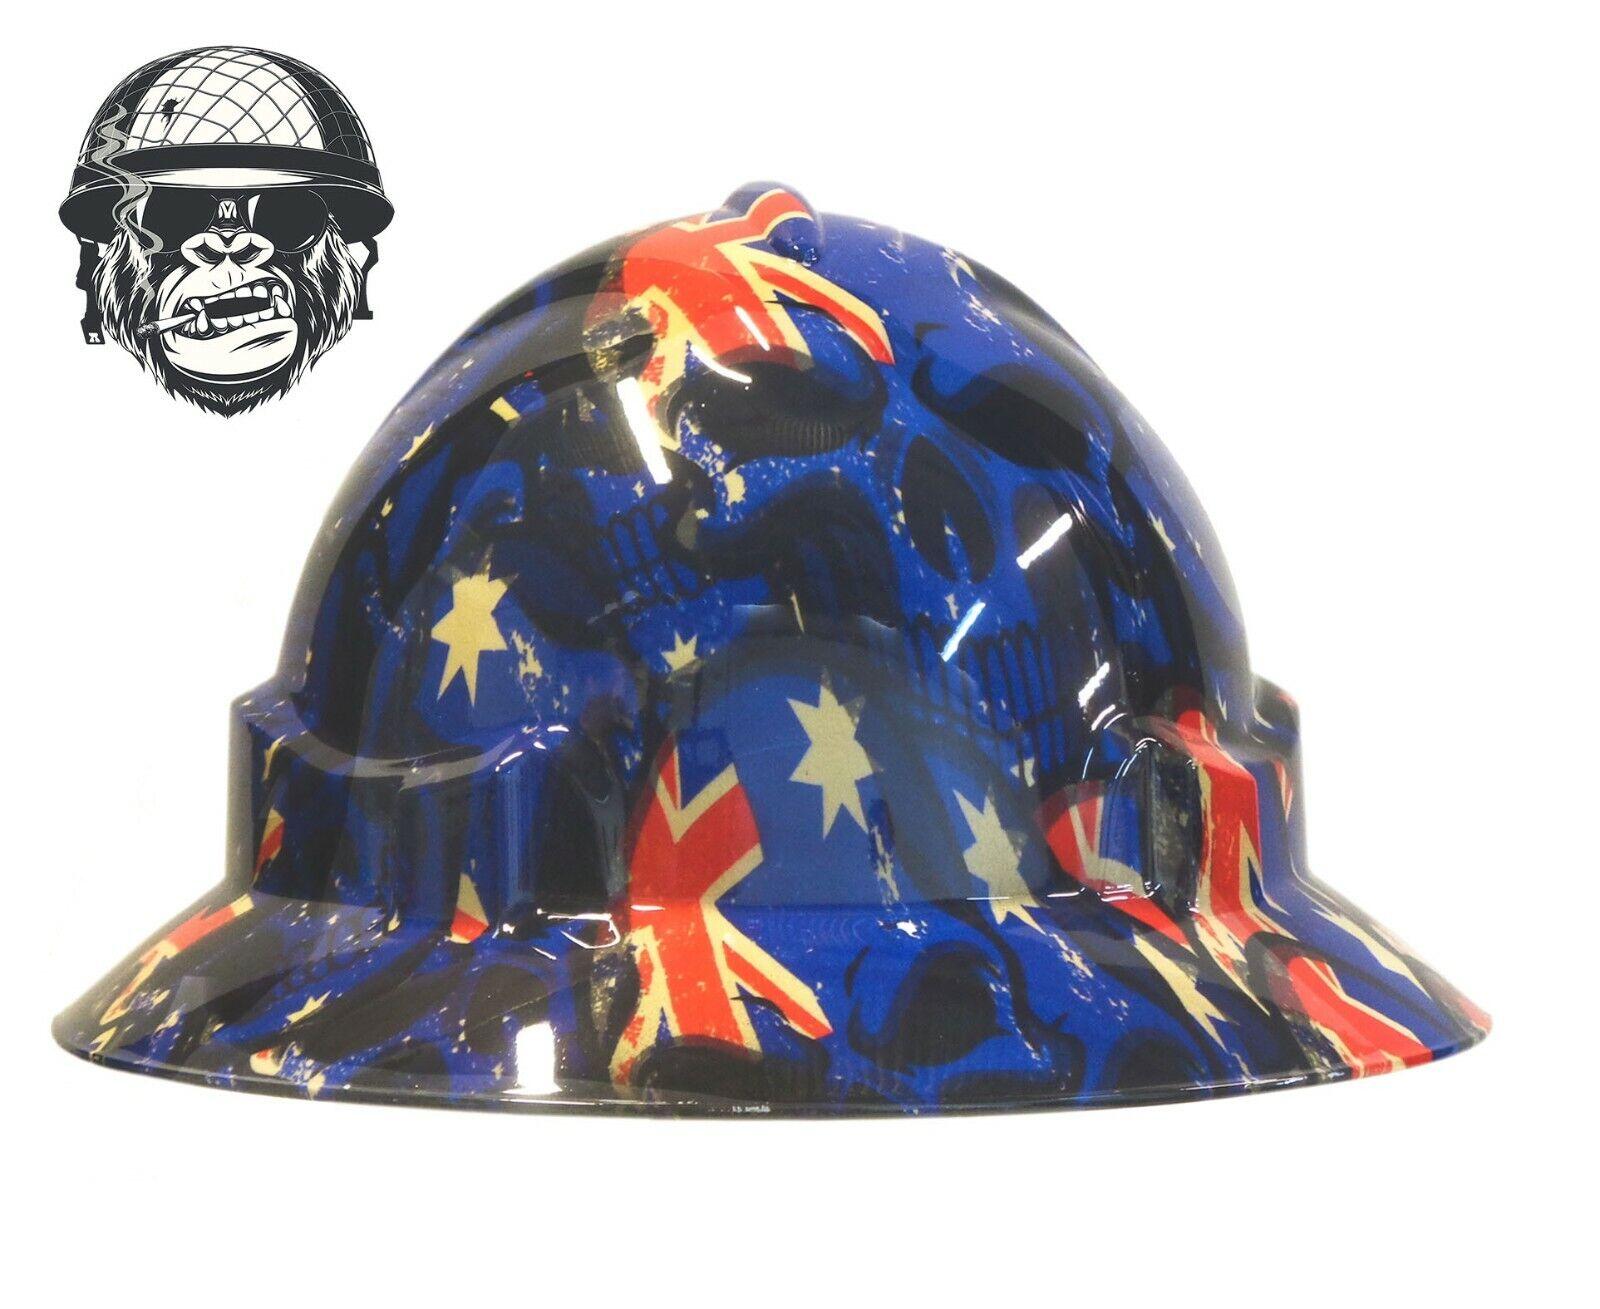 Custom Hydrographic Wide Brim Safety Hard Hat Skulls AUSSIE TO THE CORE WIDE